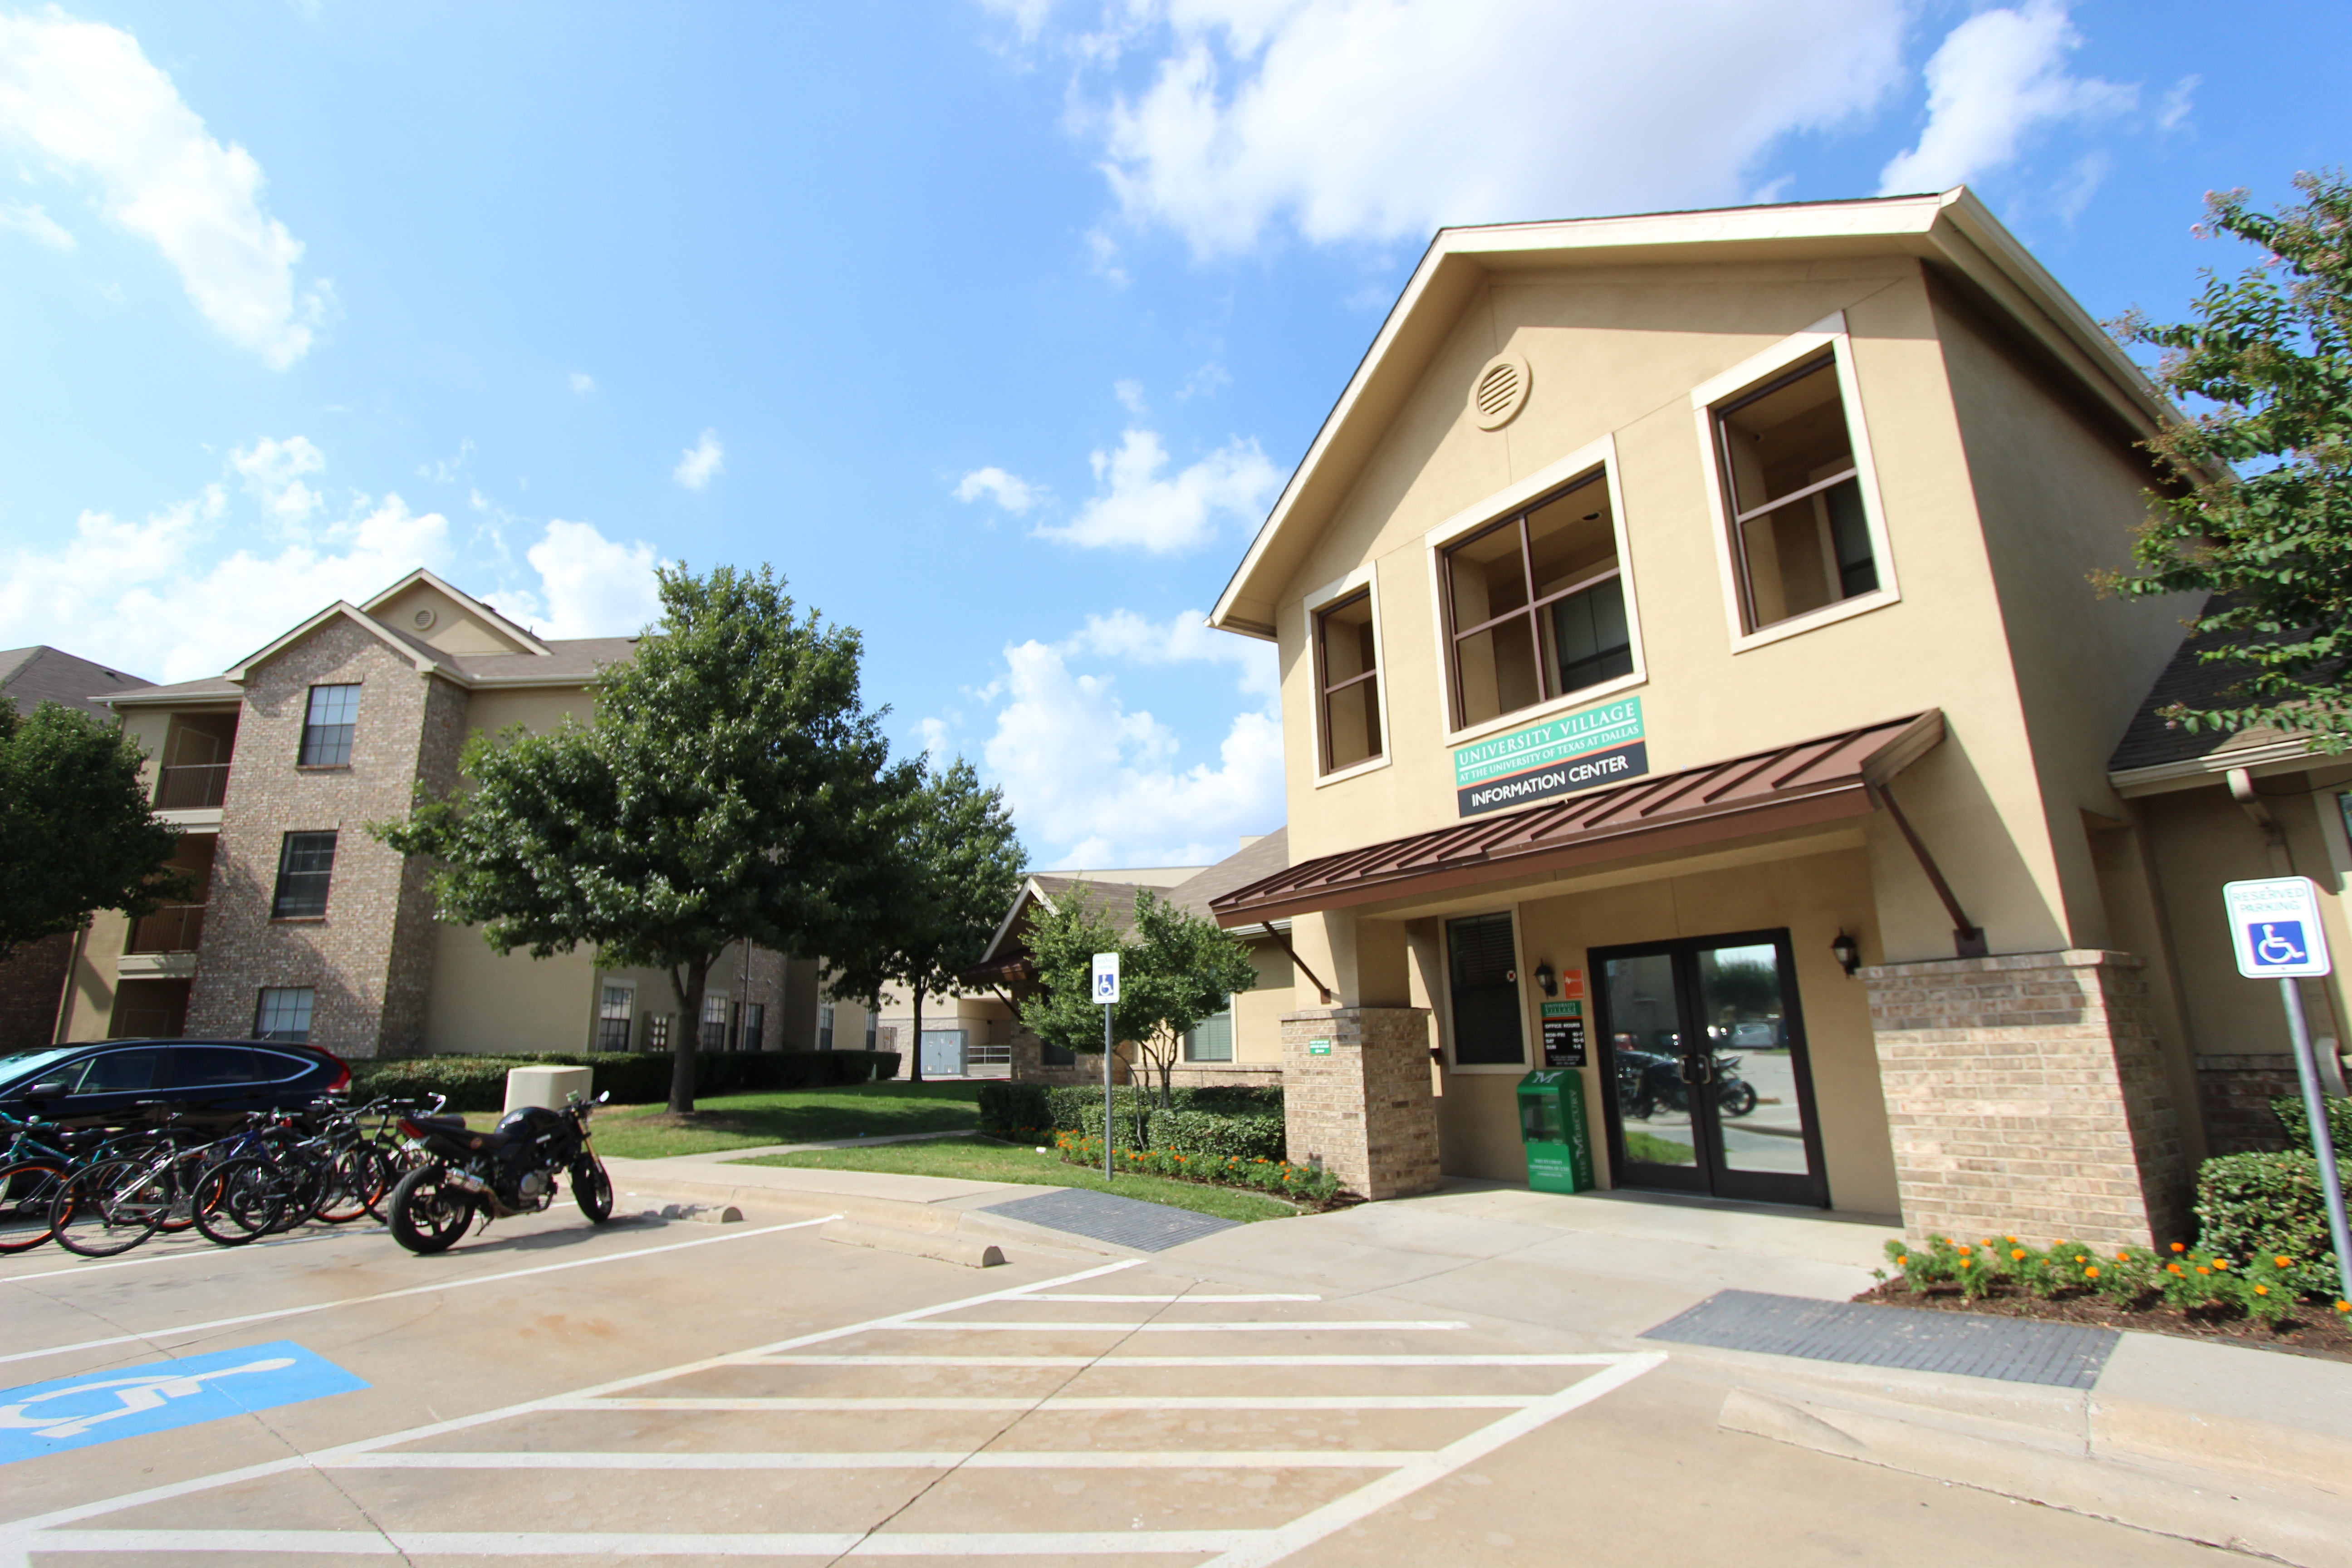 UTD struggles to meet demand for housing